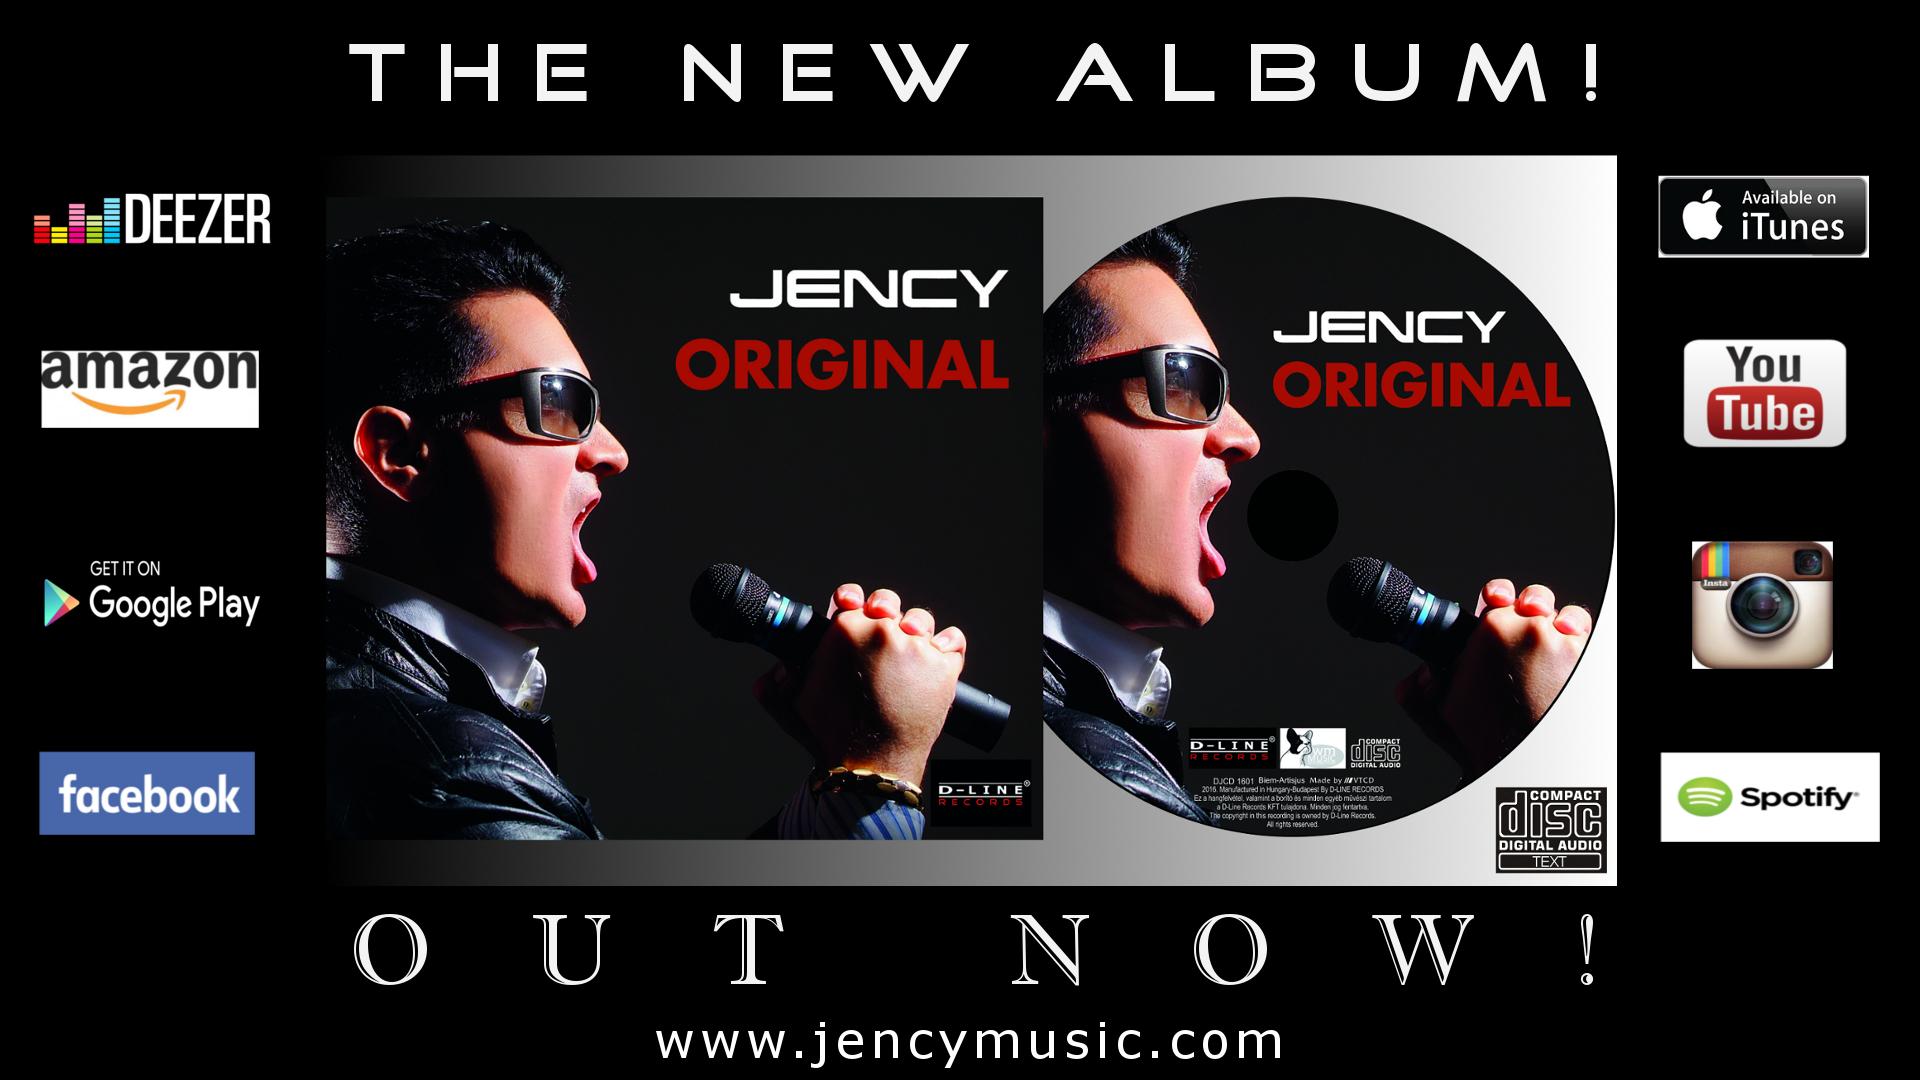 új album+logok angol